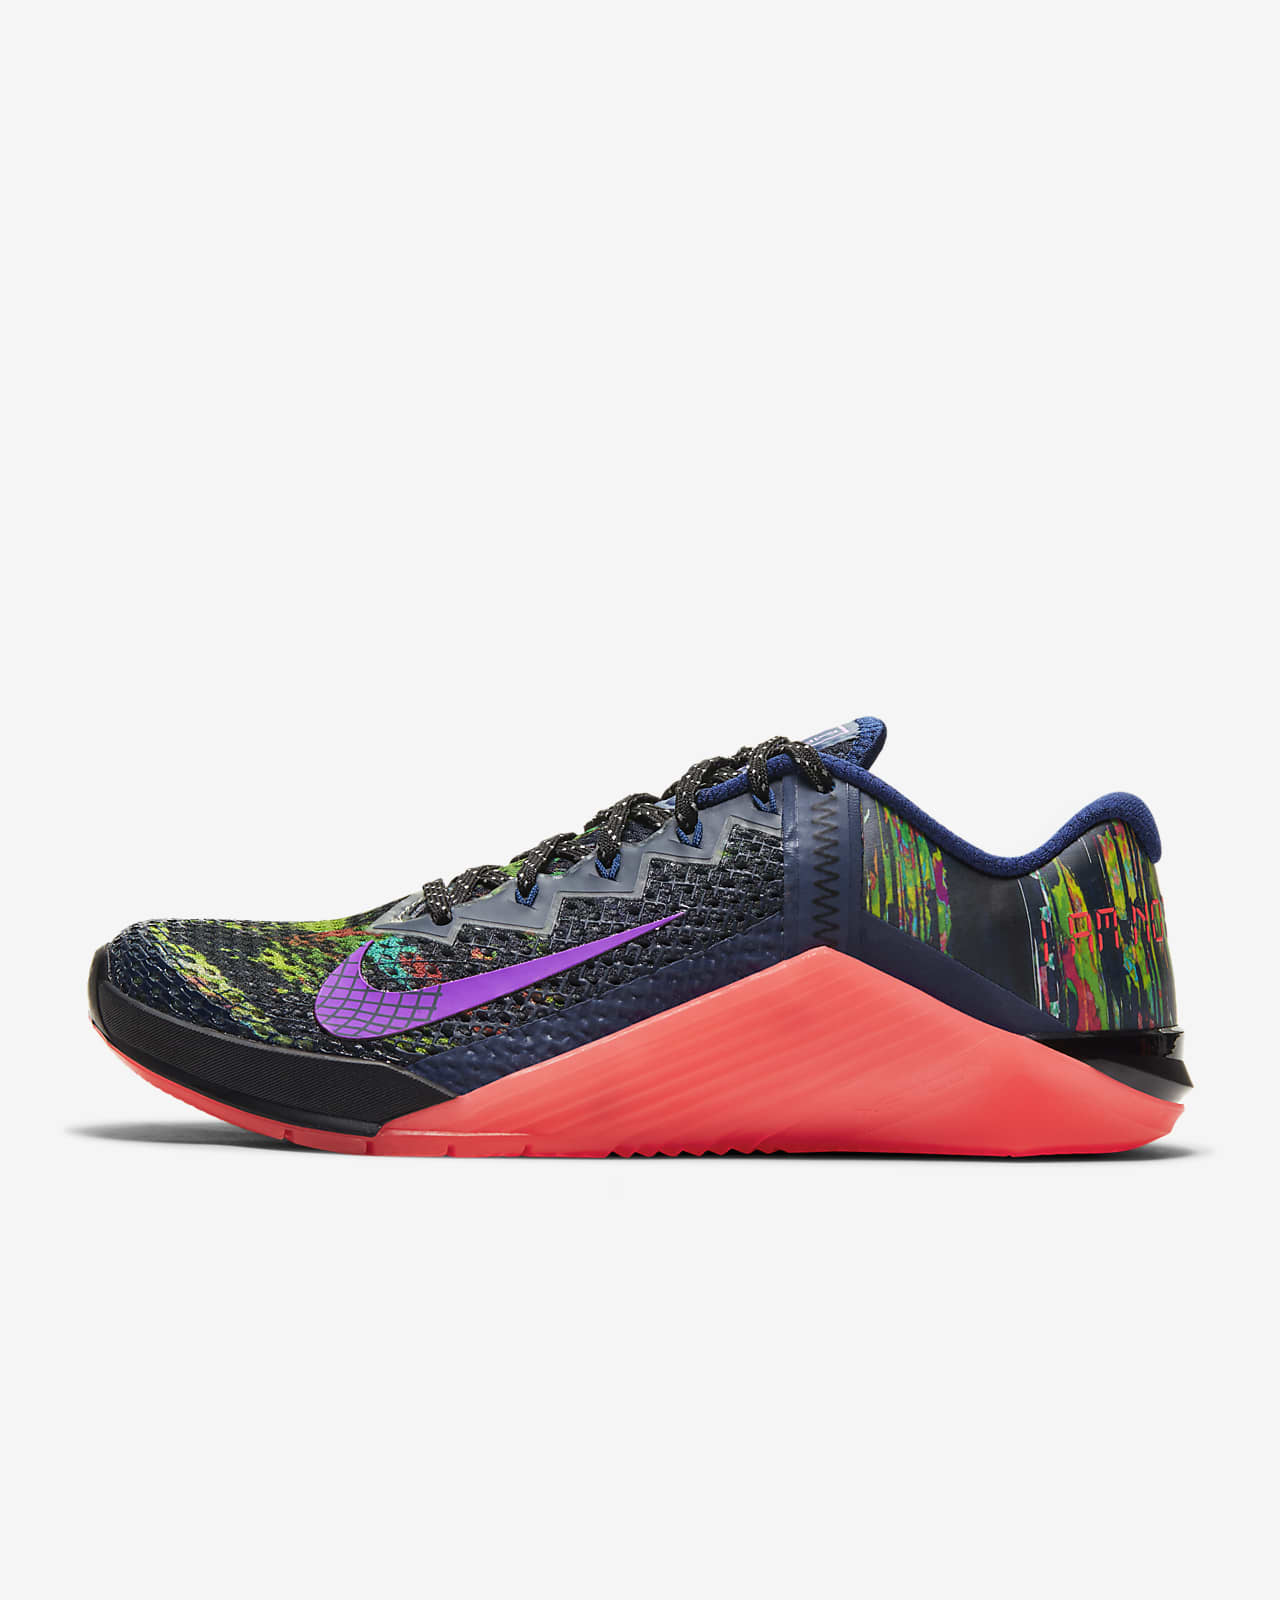 Nike Metcon 6 AMP Damen-Trainingsschuh